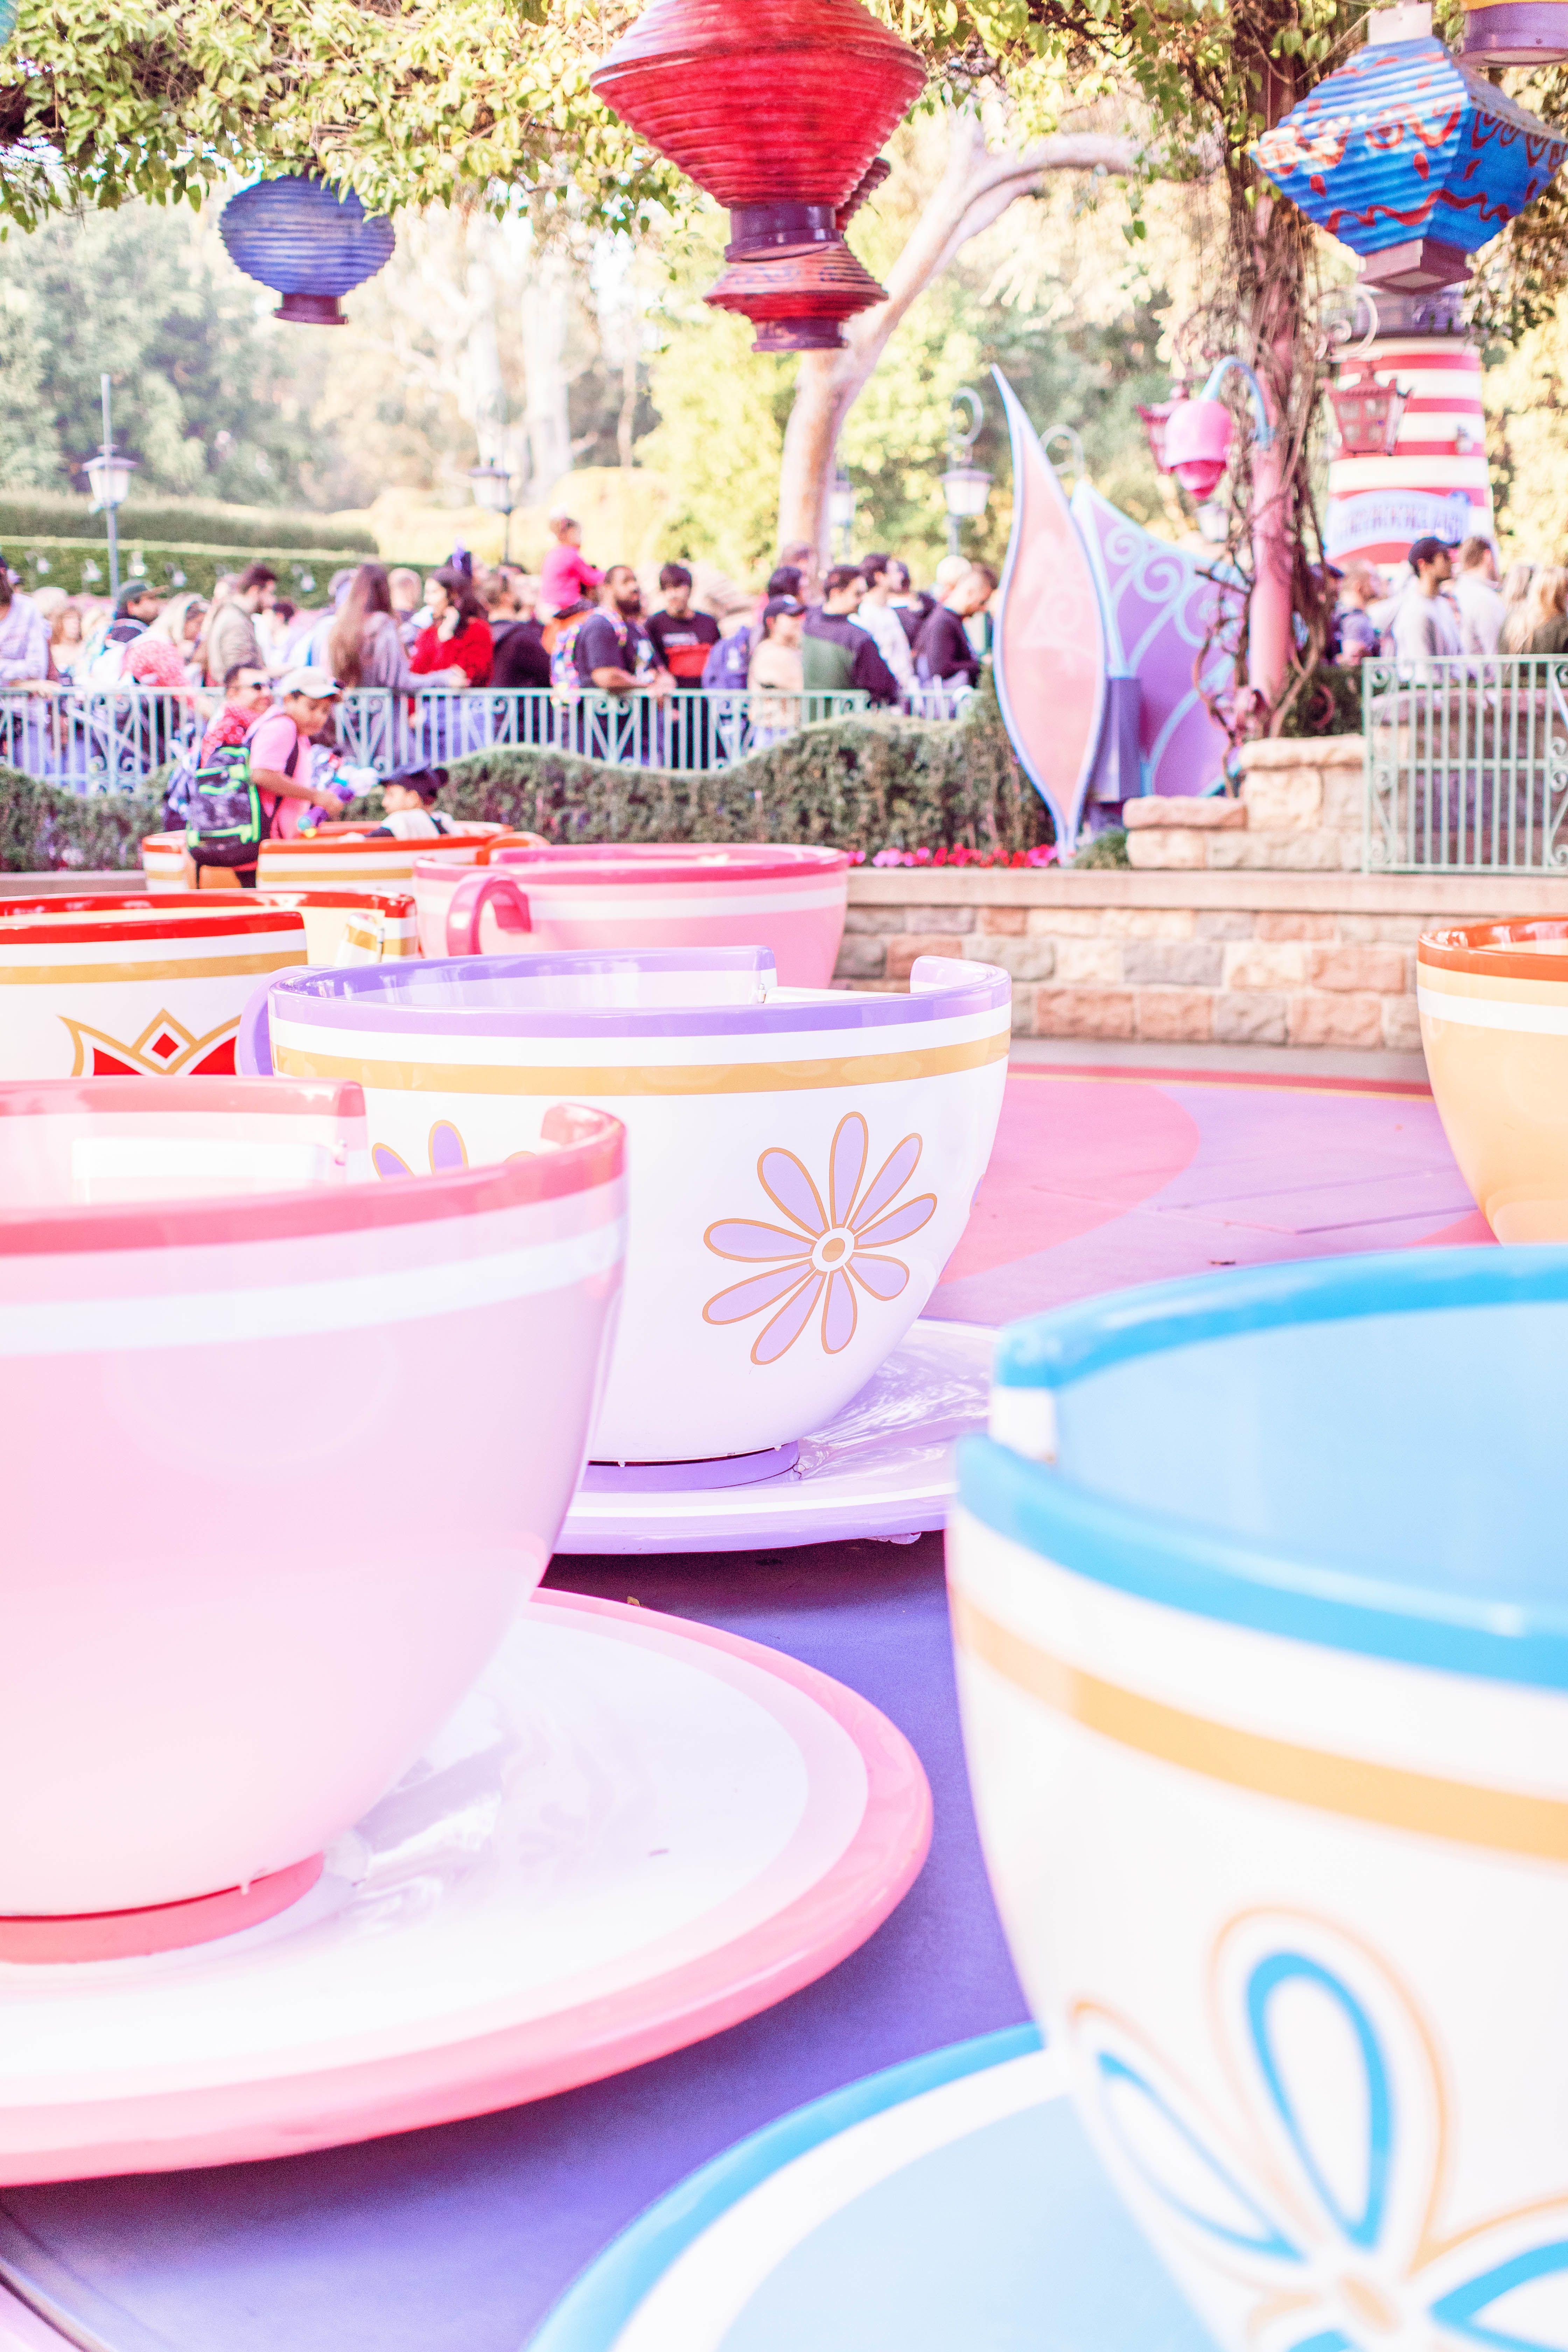 Disneyland 2019 Holiday Trip Report in 2020   Holiday travel, Disneyland, Fairy tales